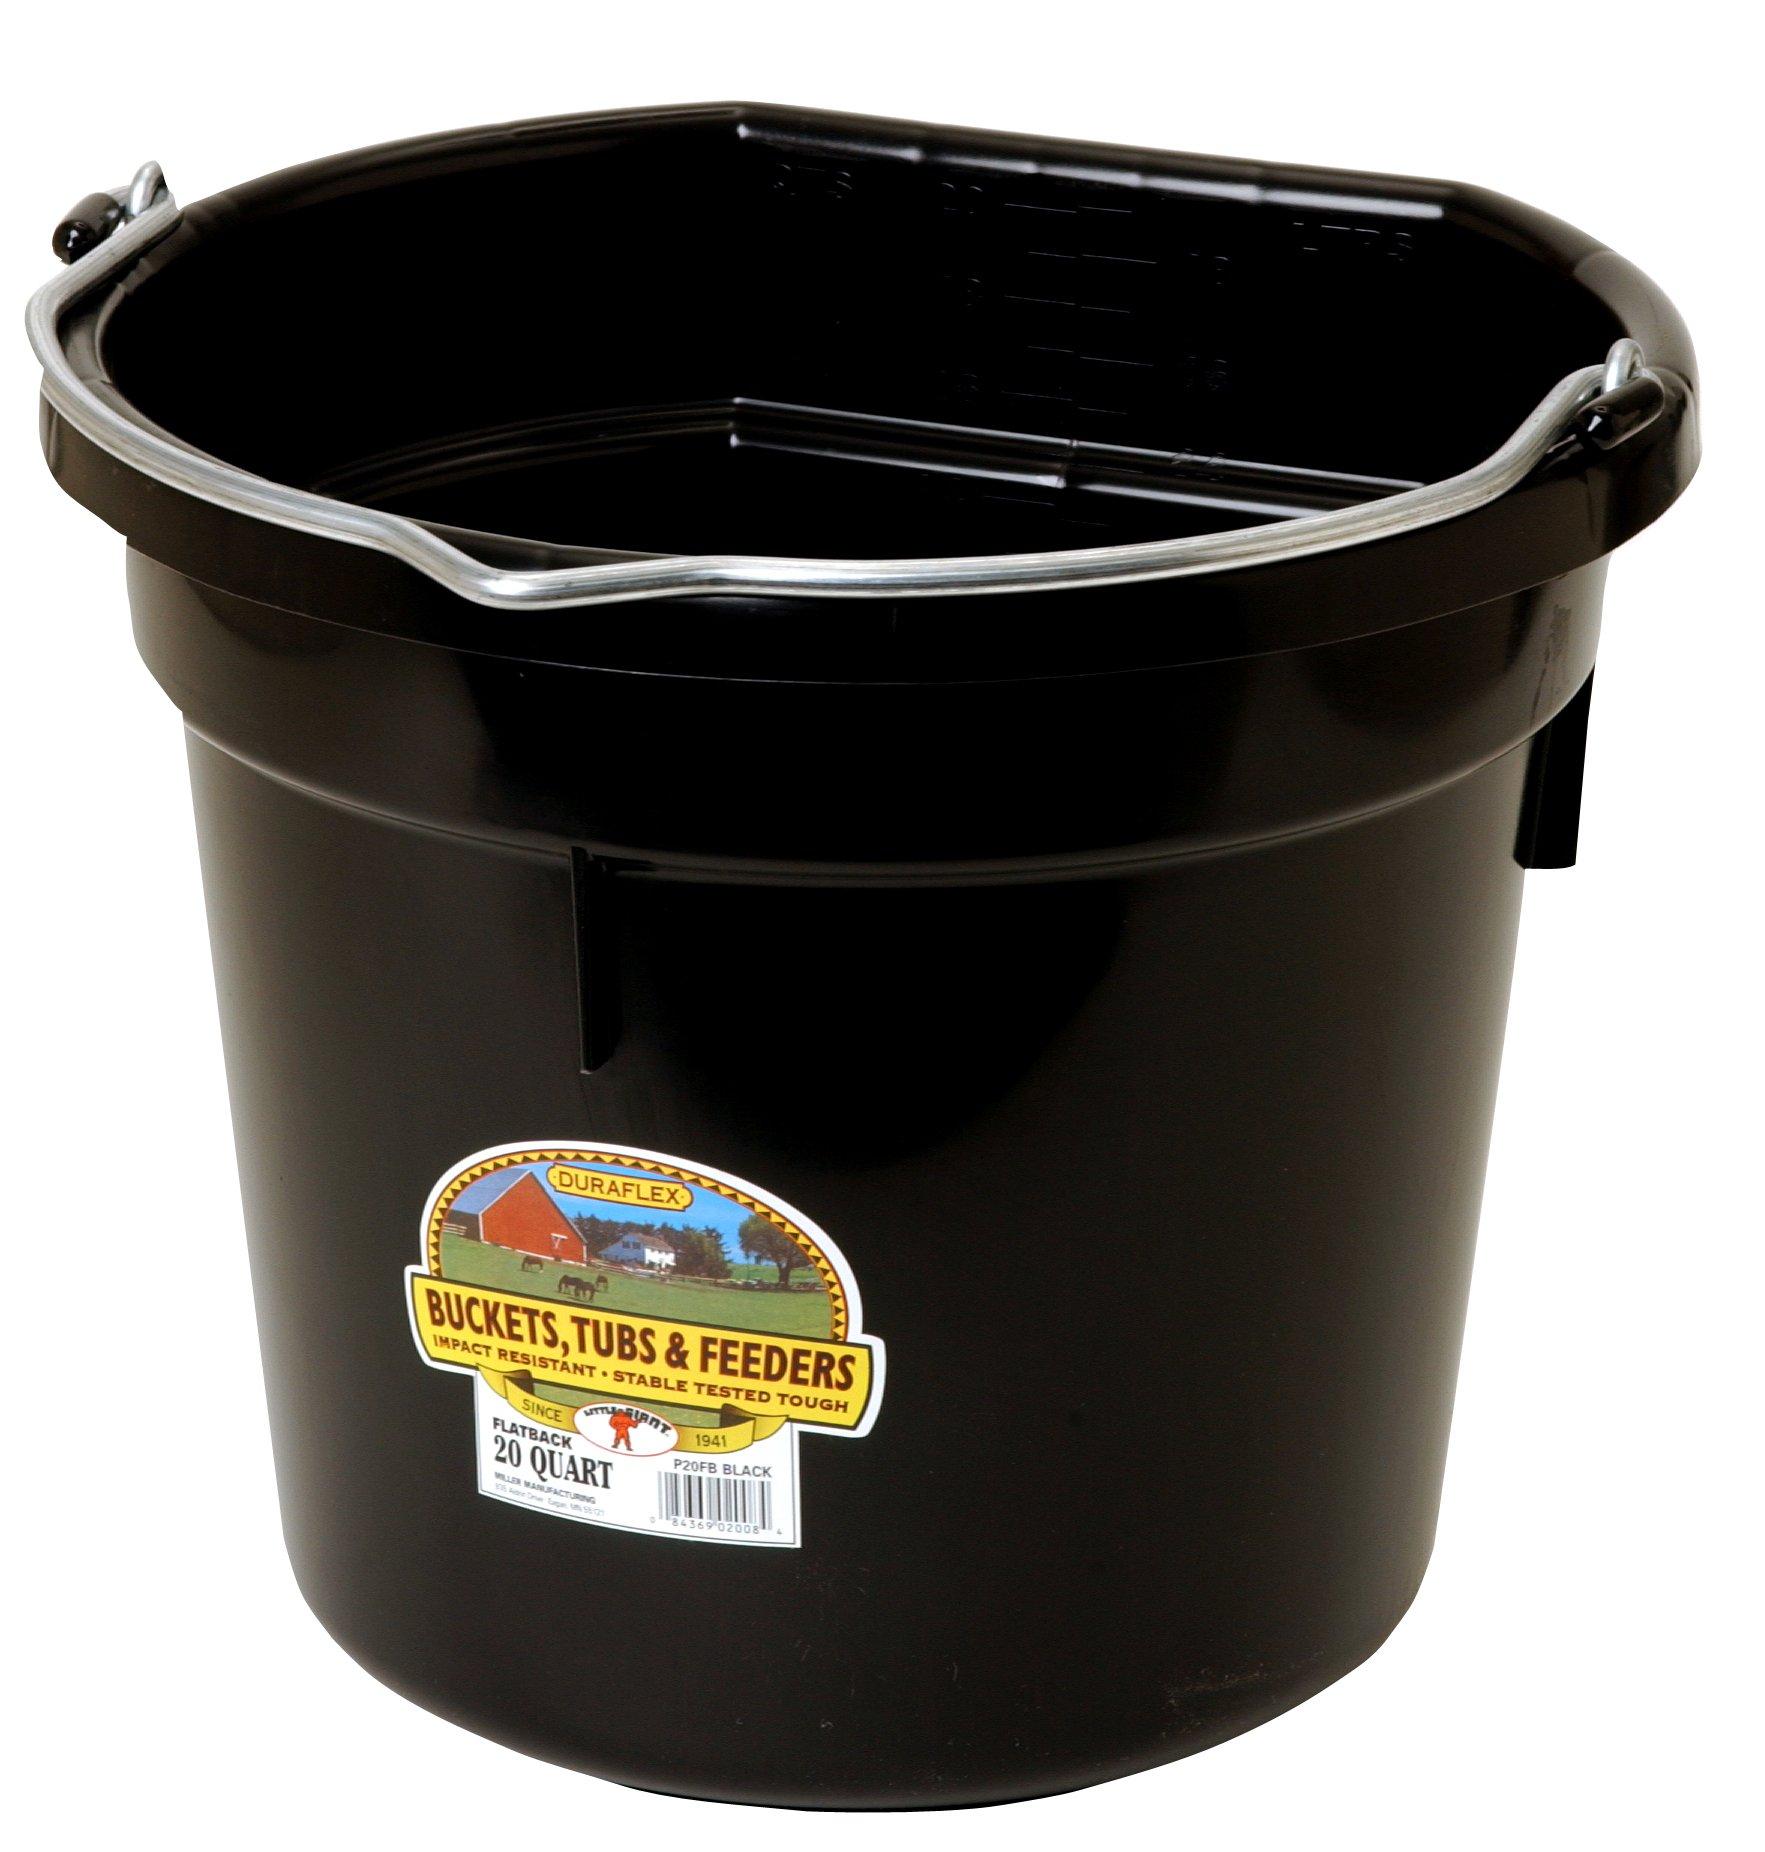 LITTLE GIANT 20 Quart Black Flat Plastic Bucket P20FBBLACK by LITTLE GIANT